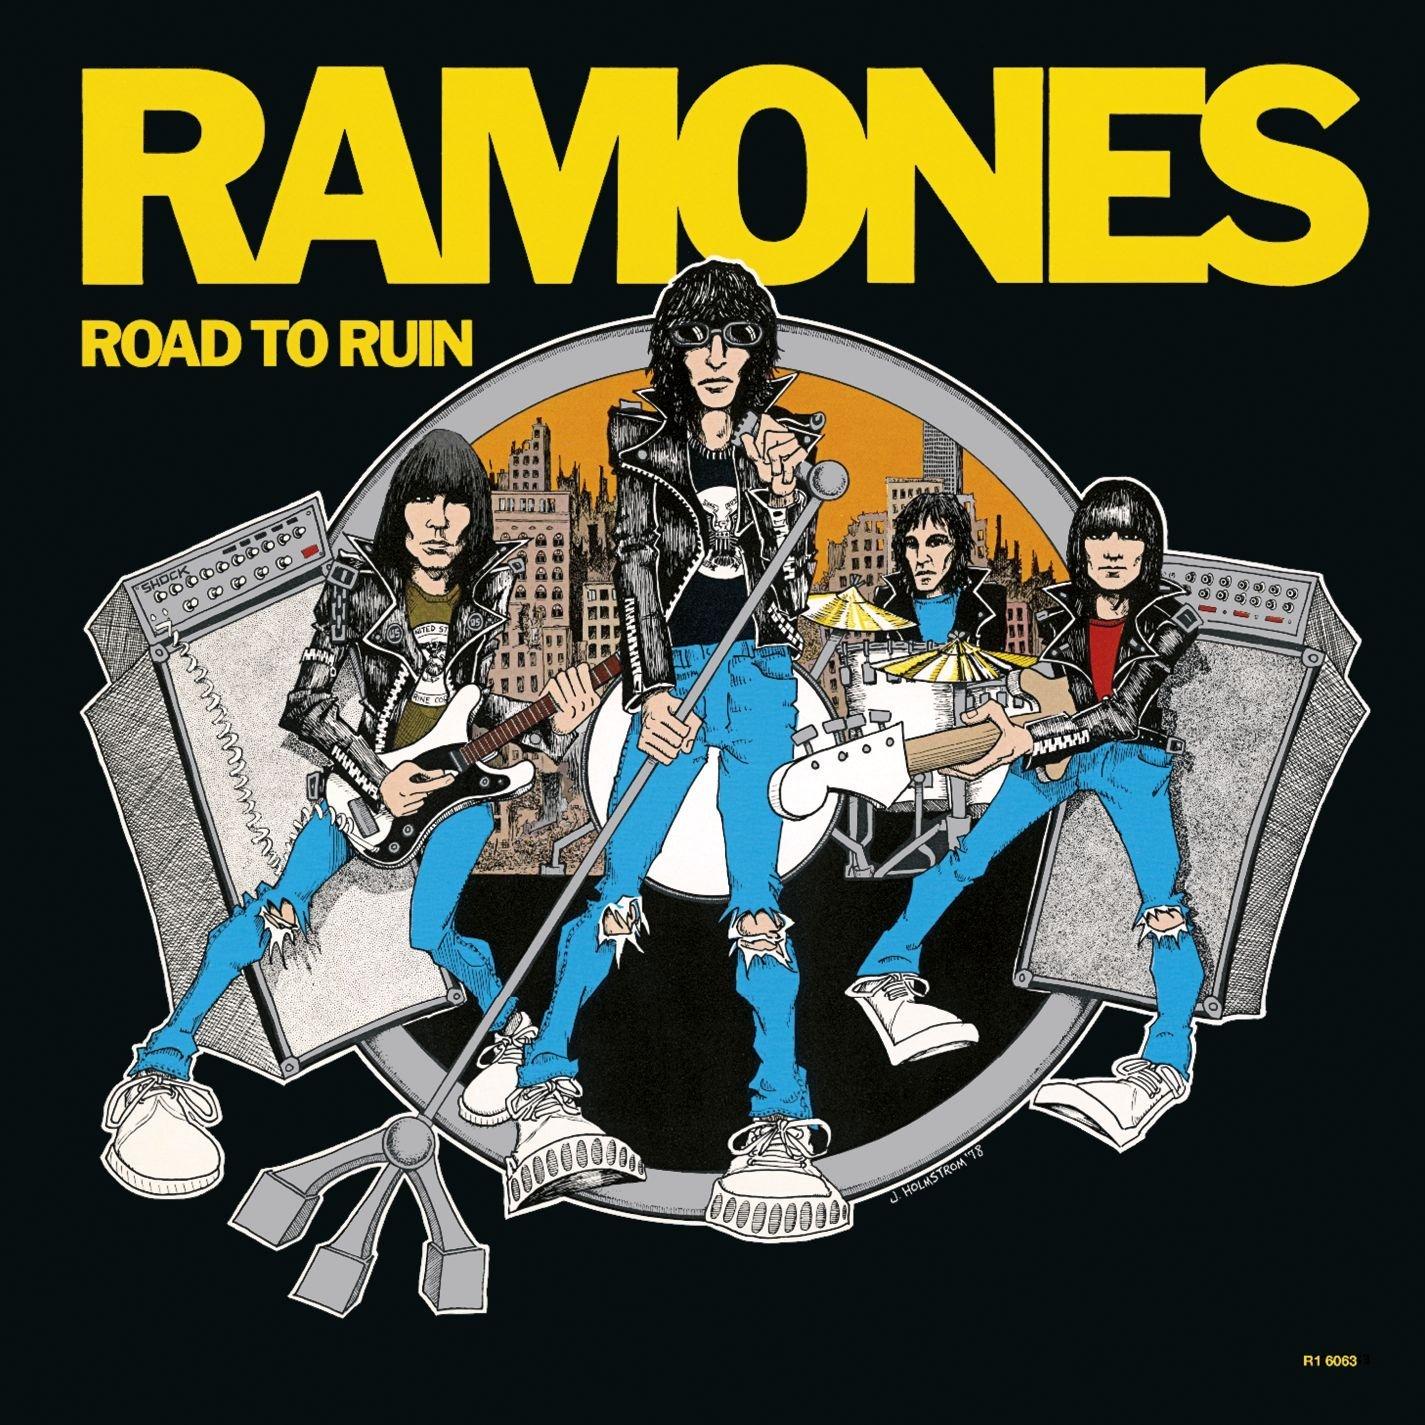 Ramones - Road to Ruin (Sire Records, 1978) 1 - fanzine